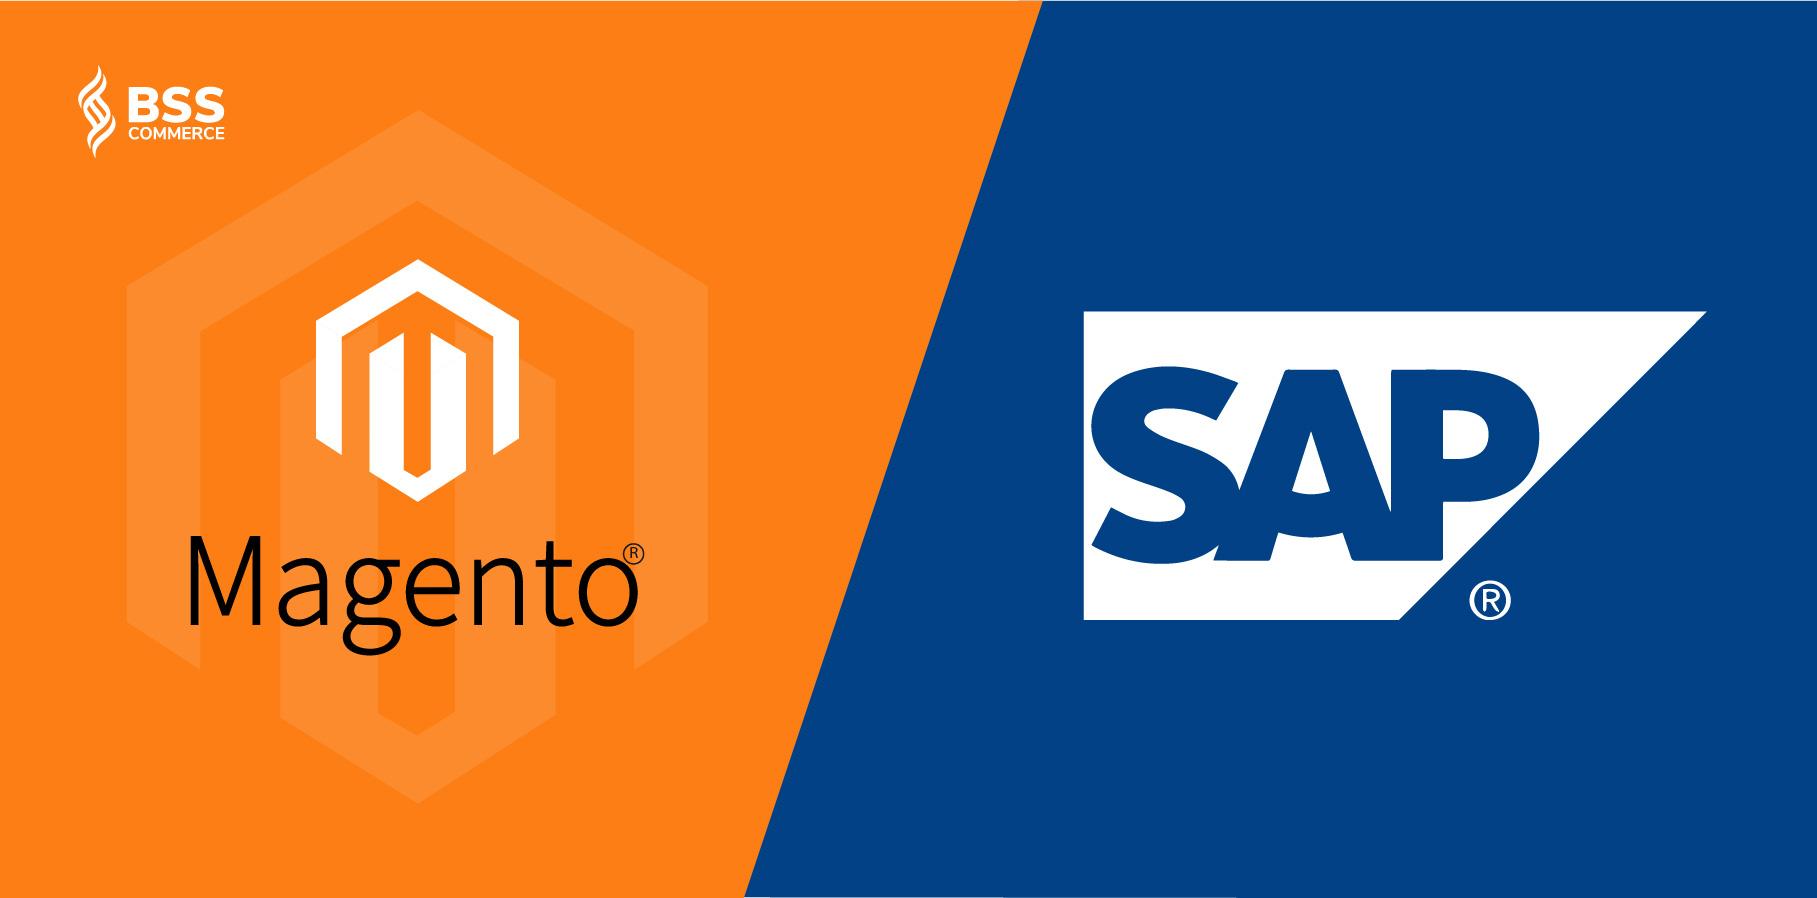 magento-vs-sap-commerce-cloud-featured-image